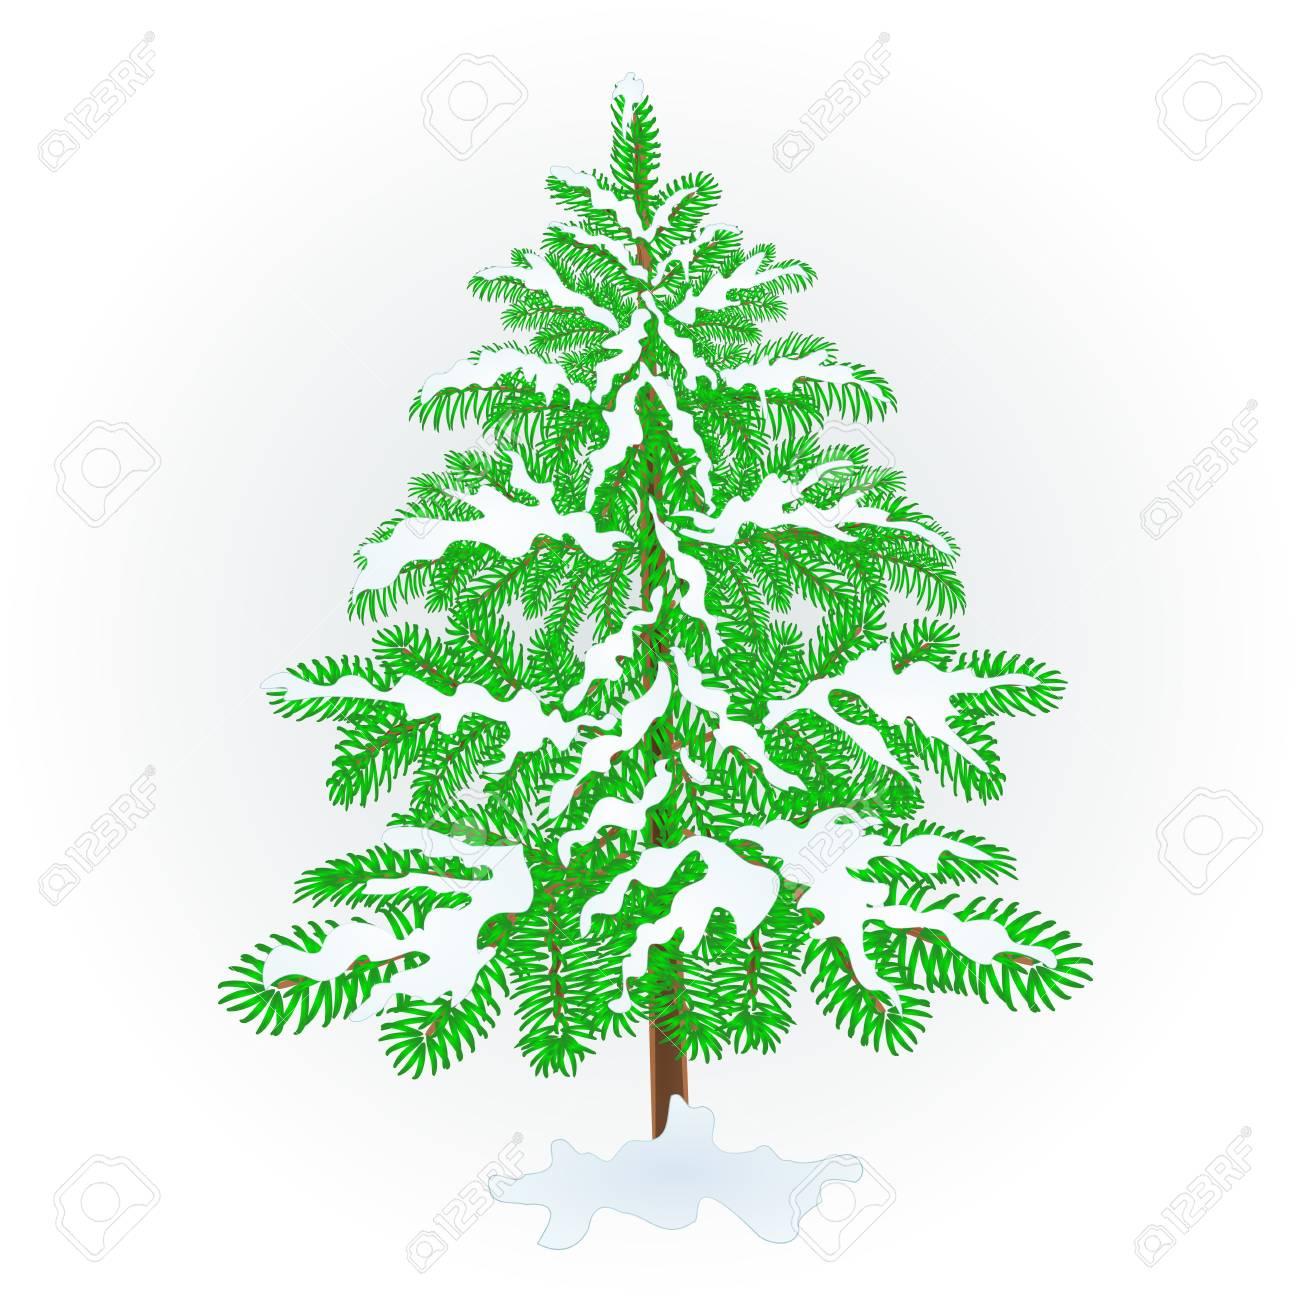 Spruce Christmas Tree With Snow Vintage Vector Illustration Editable